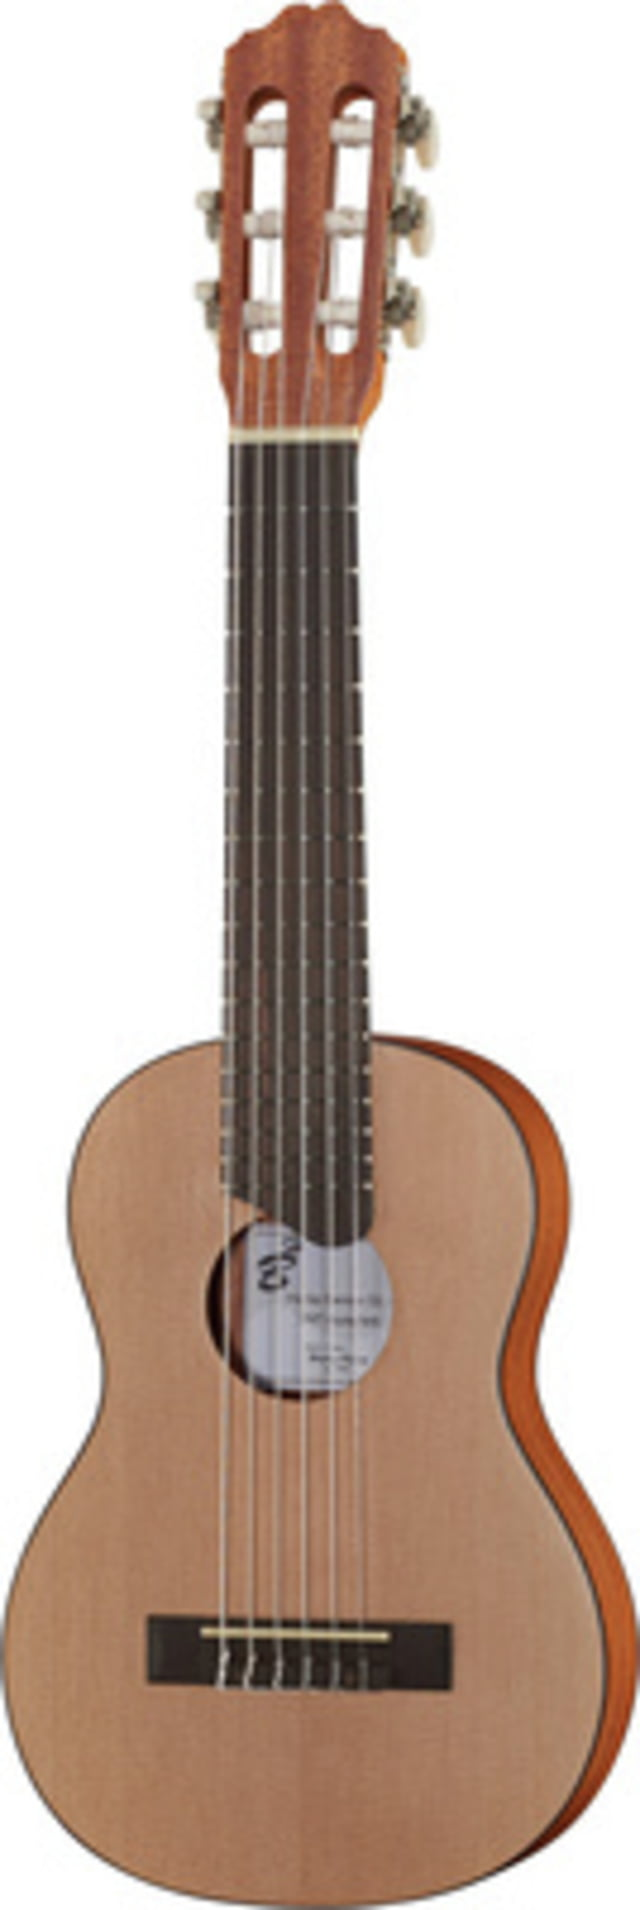 Harley Benton GL-2NT Guitarlele